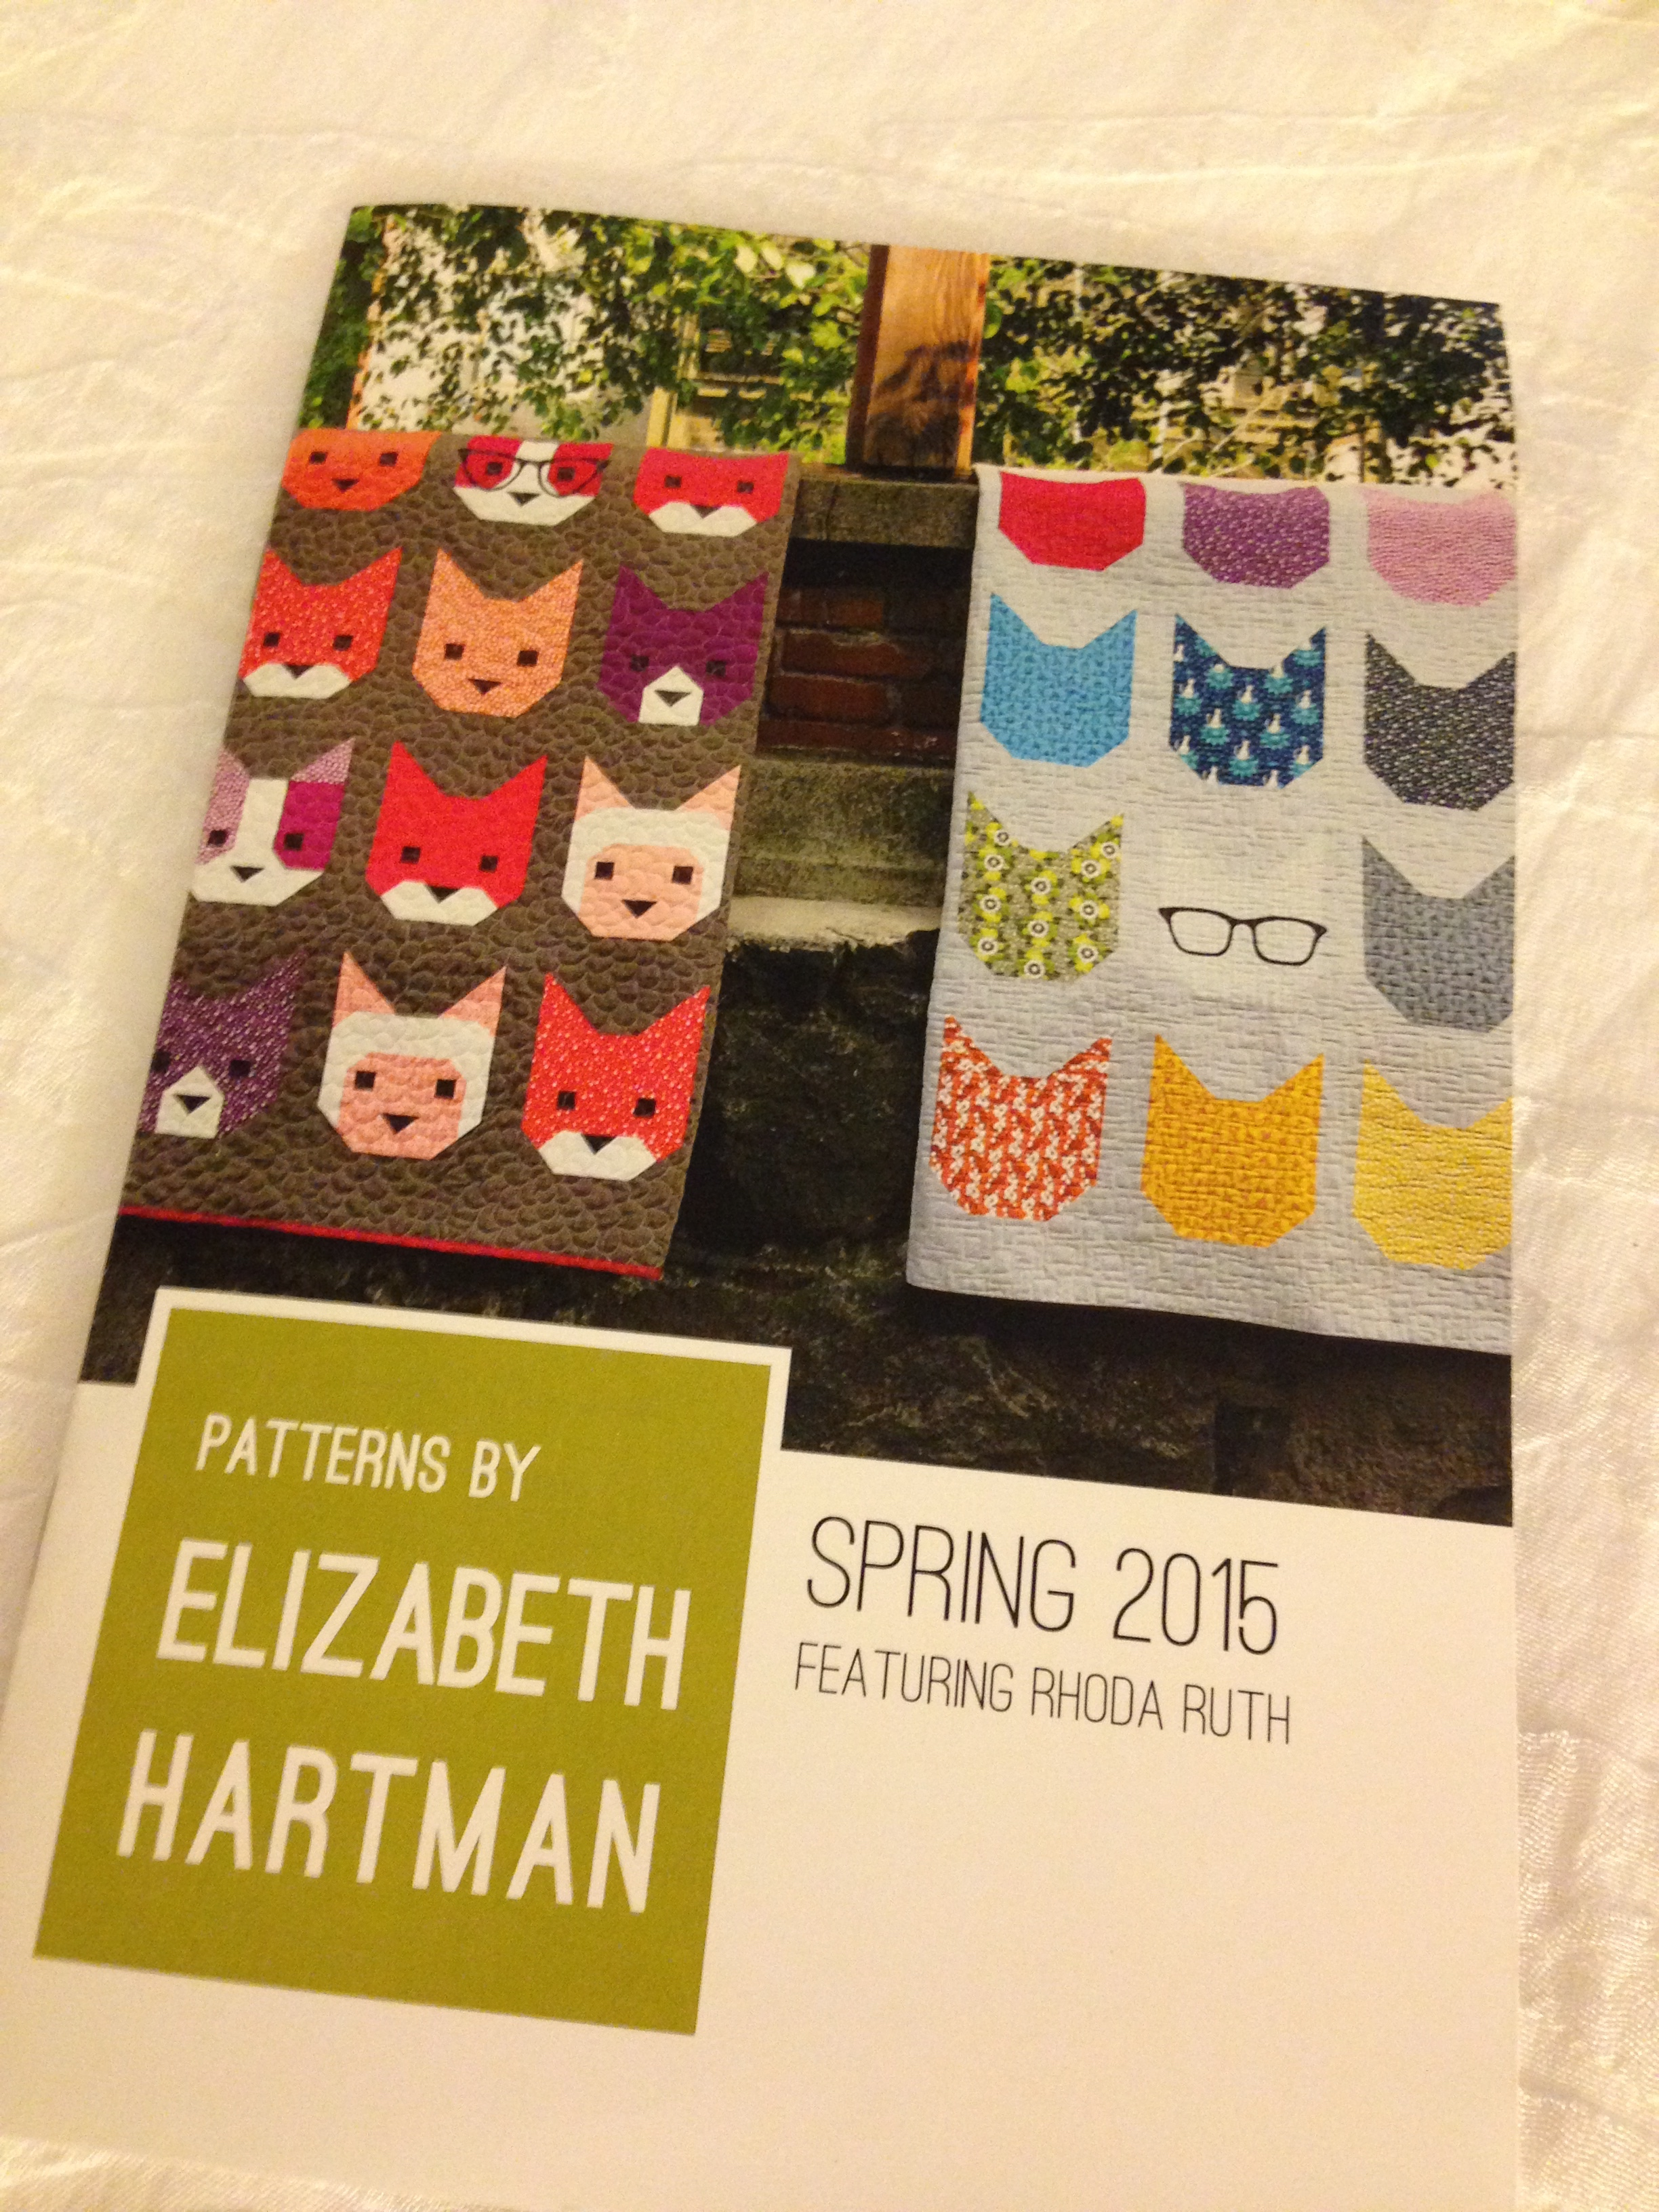 Spring offering from Elizabeth Hartman